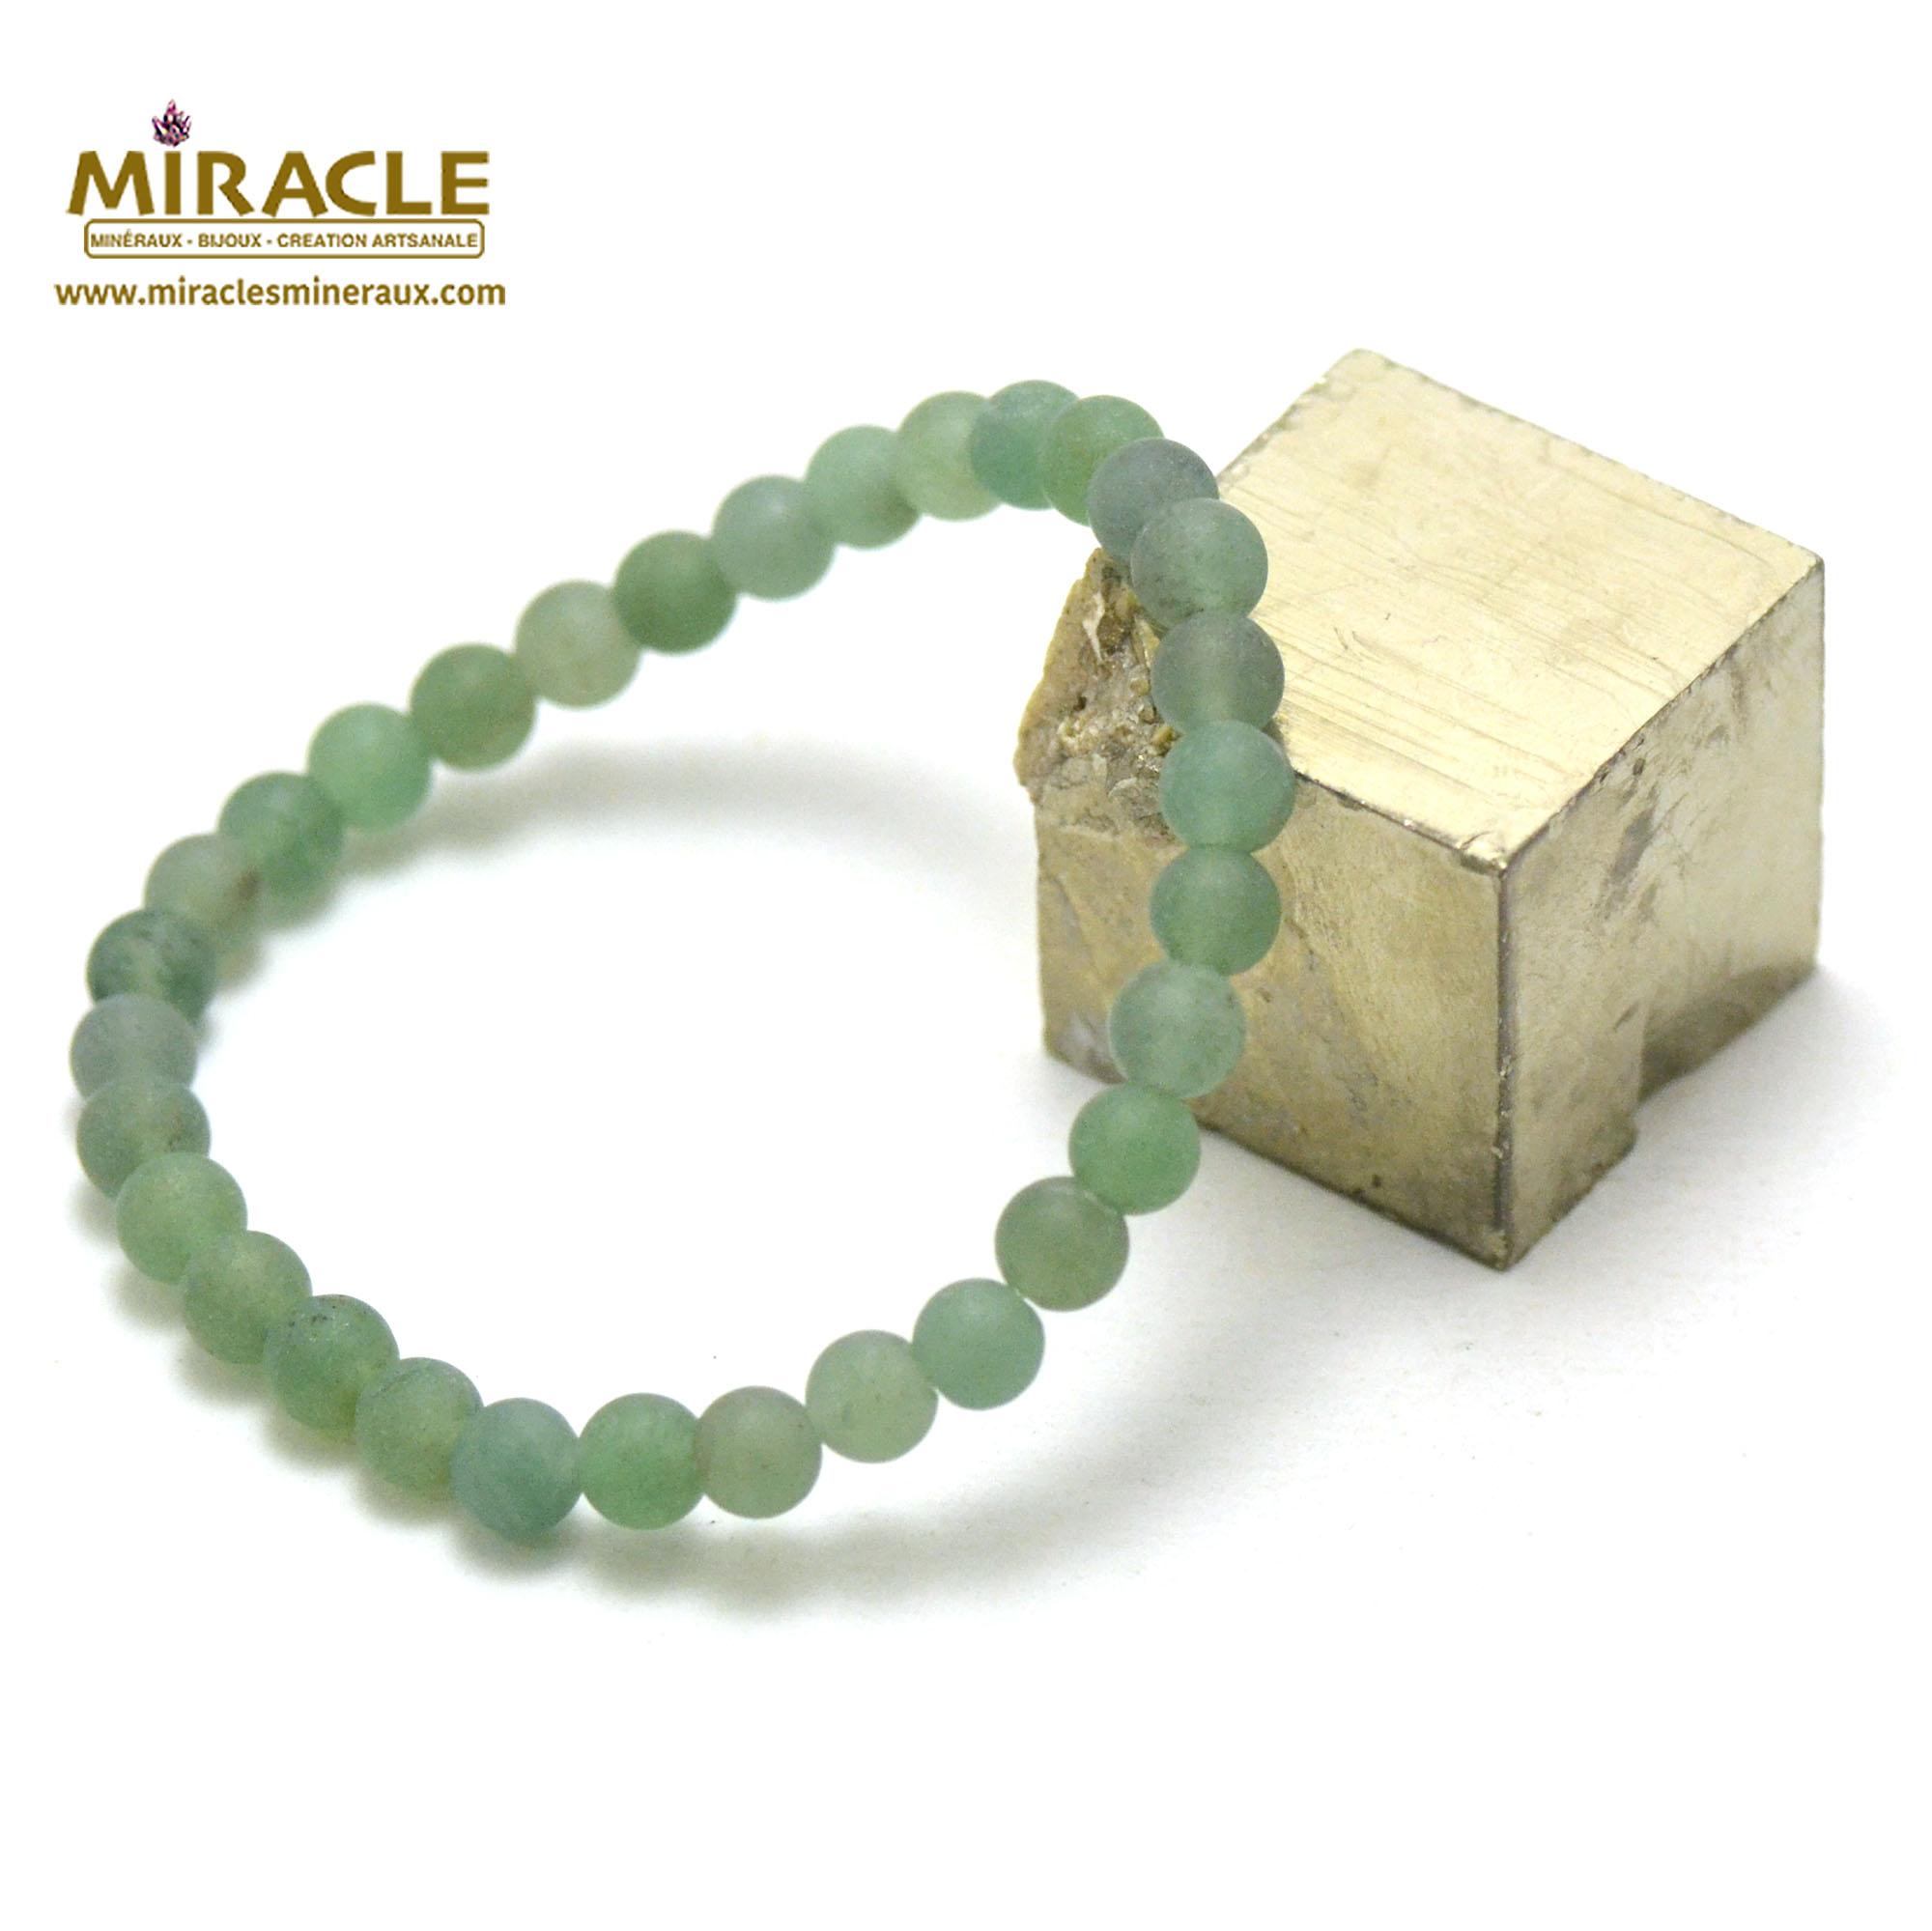 bracelet aventurine givré  perle mat ronde 6 mm